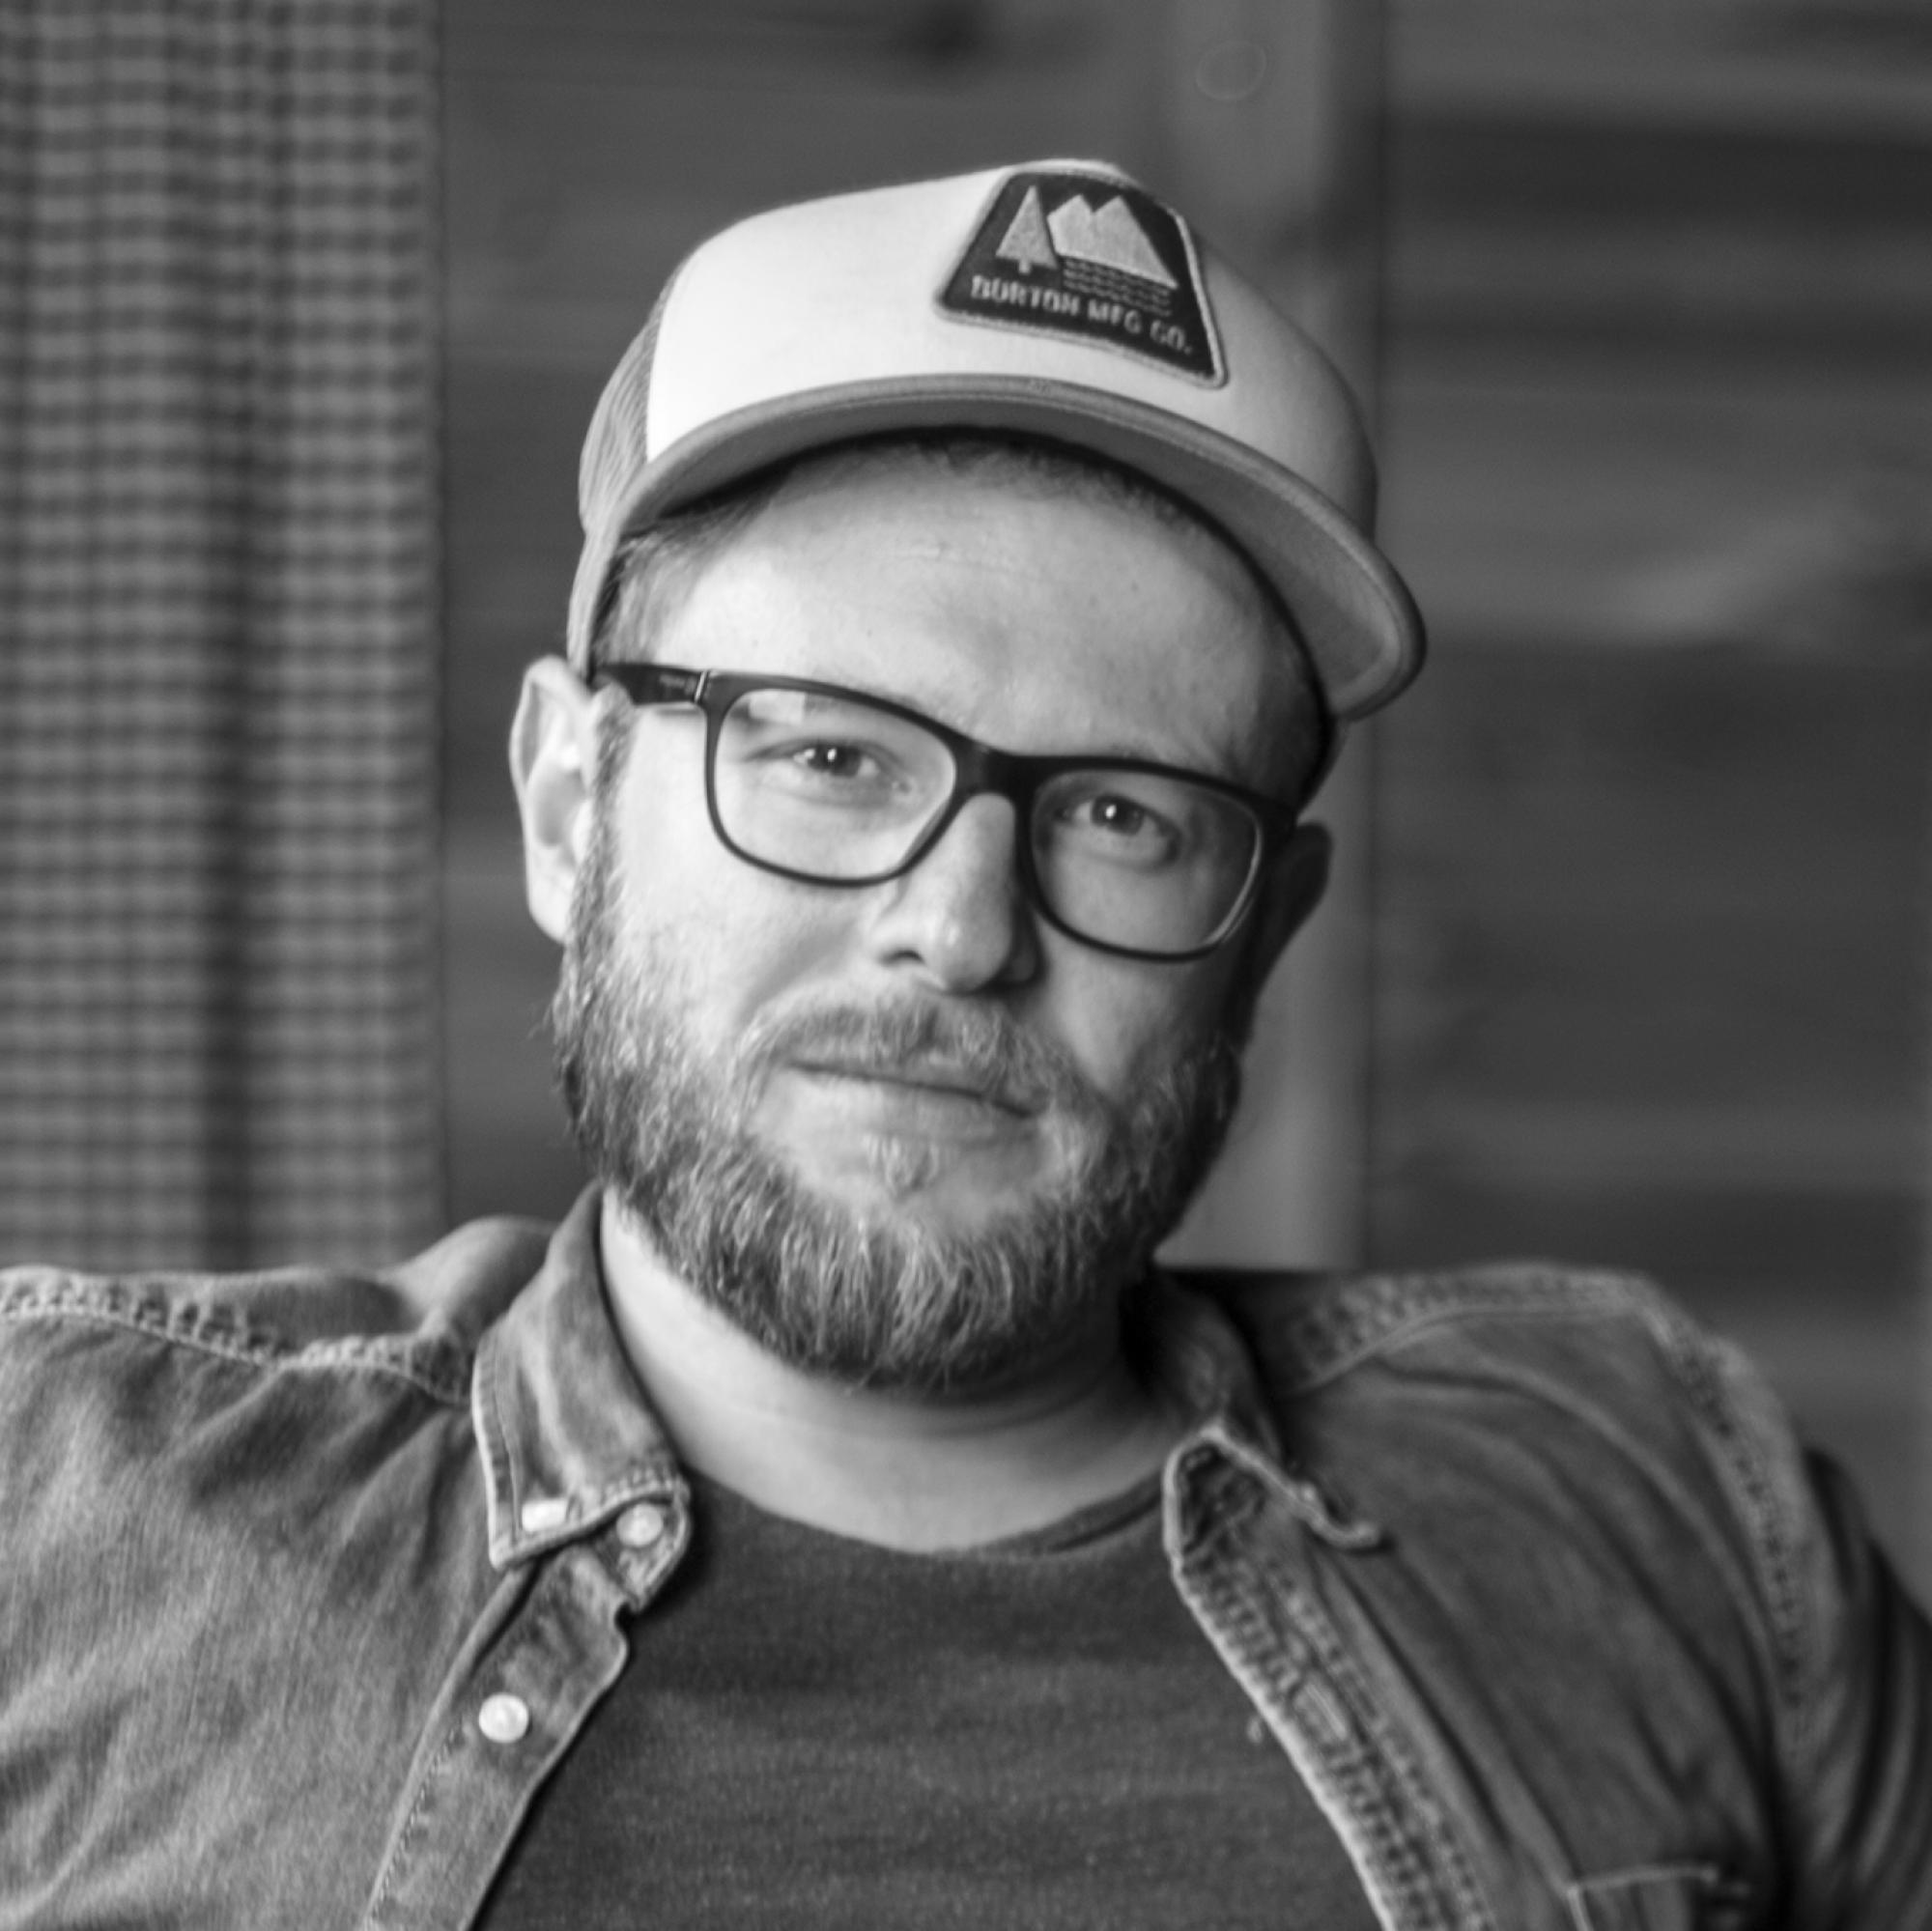 Mathias Maisberger